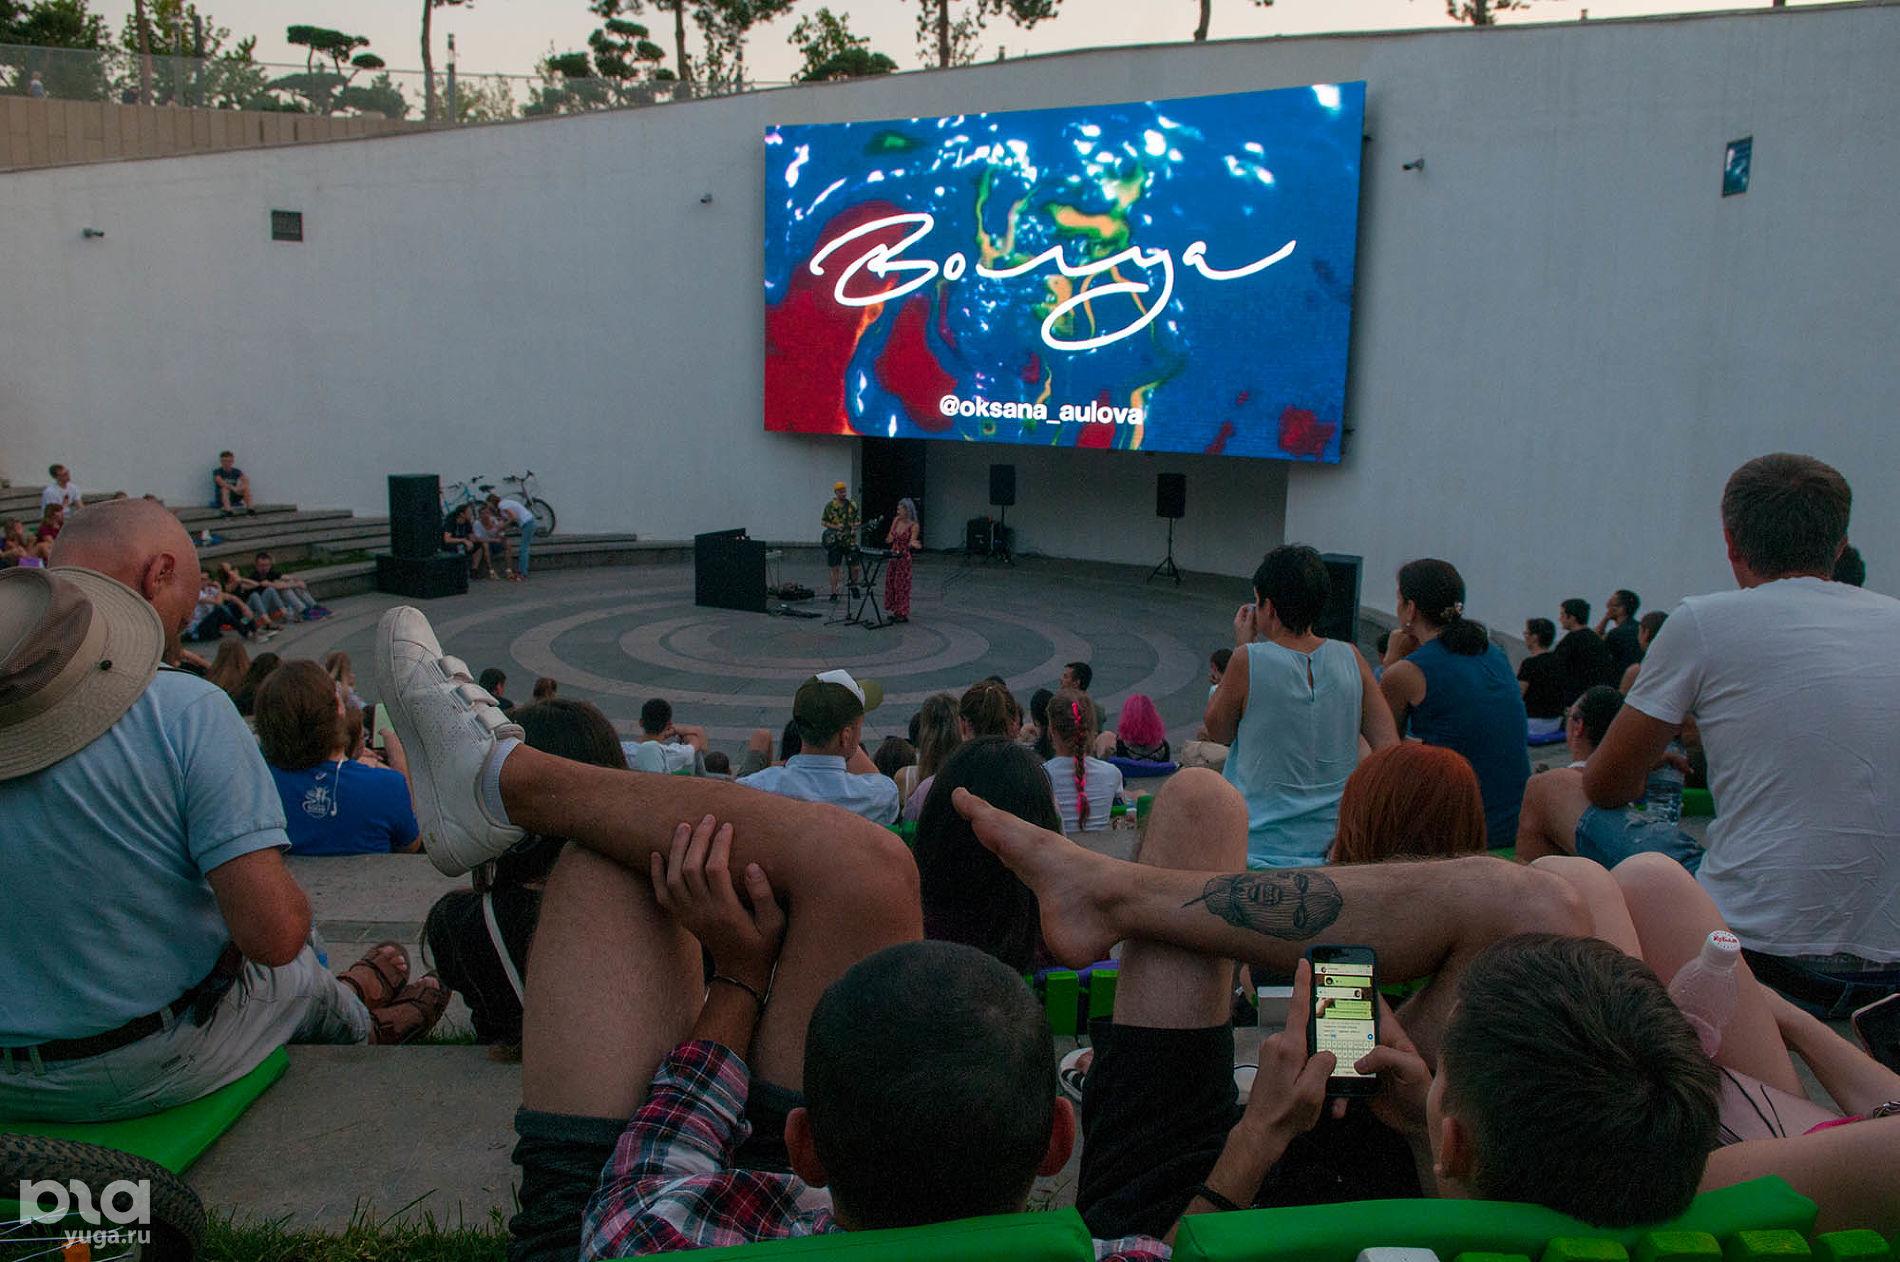 Кинопоказ в амфитеатре парка «Краснодар» ©Фото Дмитрия Пославского, Юга.ру